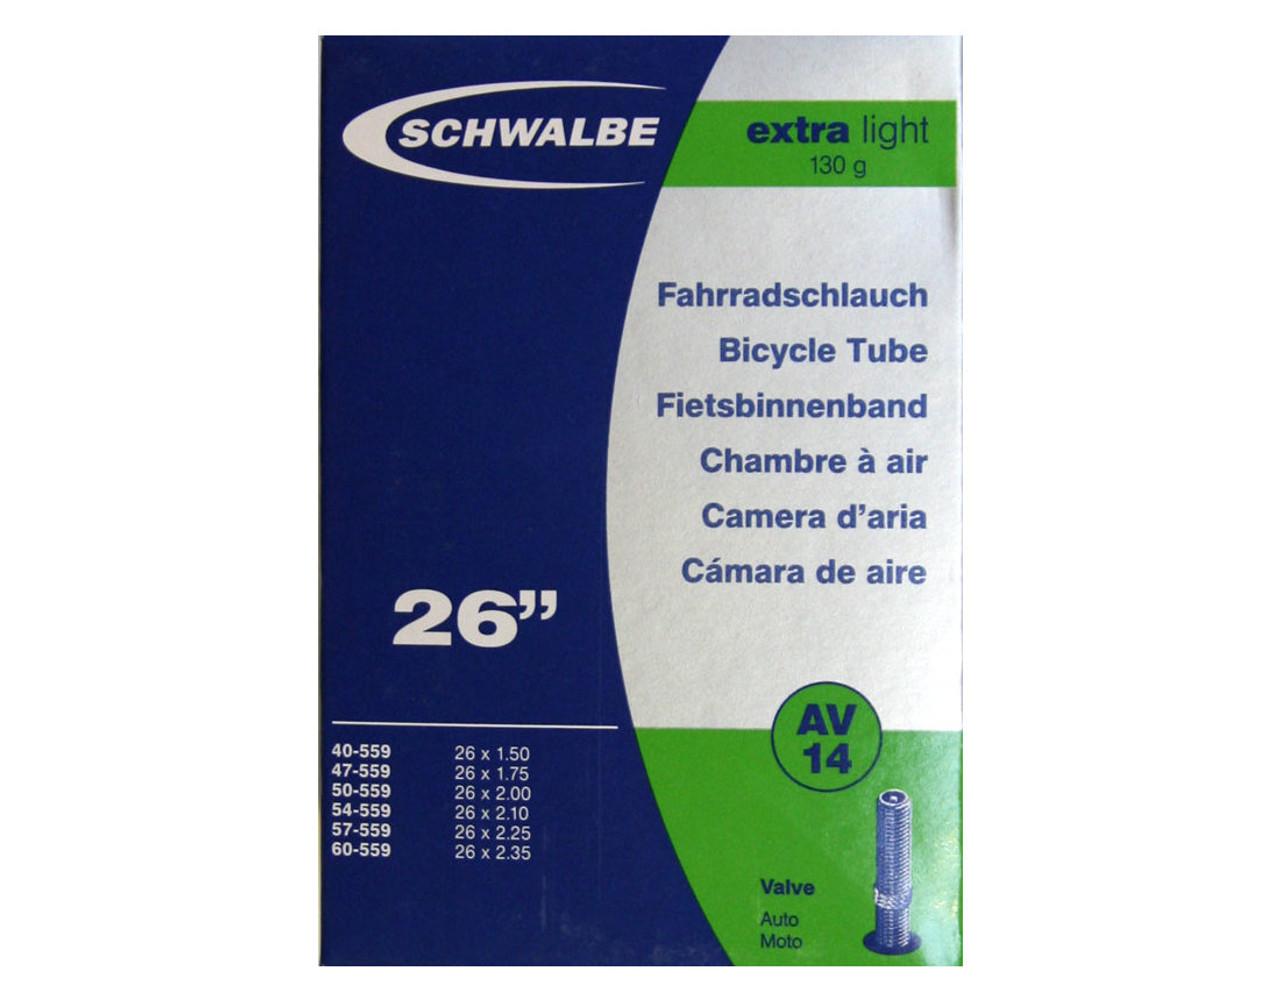 Schwalbe AV14 Extralight Inner Tube - 26 x 1.50/2.35 - 40mm Schrader Valve